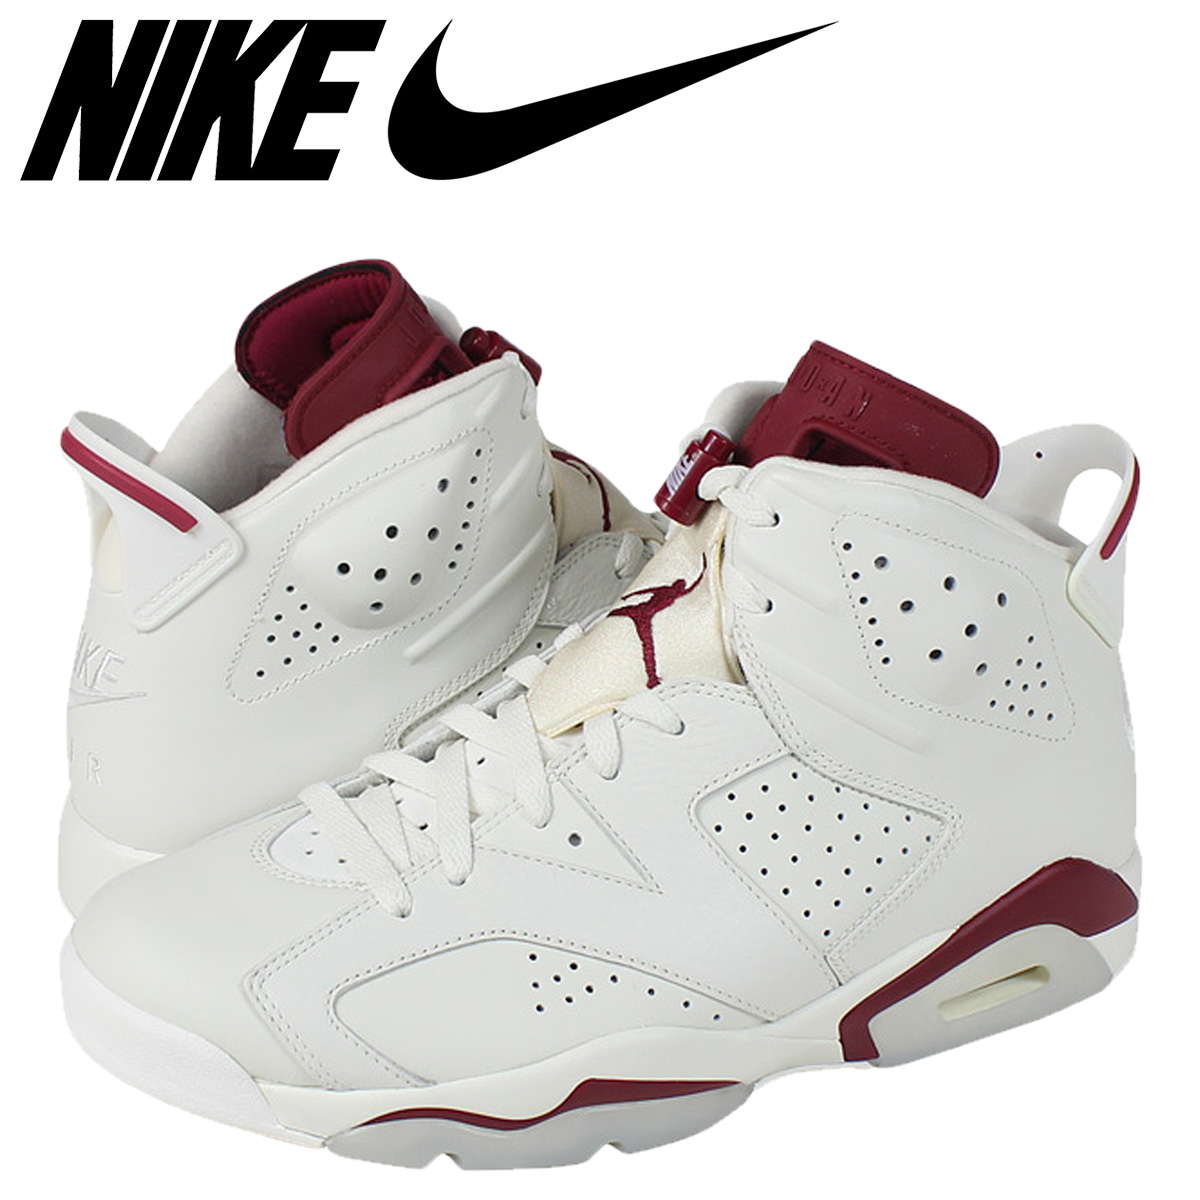 c09e357edaeb ... SOLD OUT Nike NIKE Air Jordan sneakers AIR JORDAN 6 RETRO MAROON Air  Jordan 6 retro ...